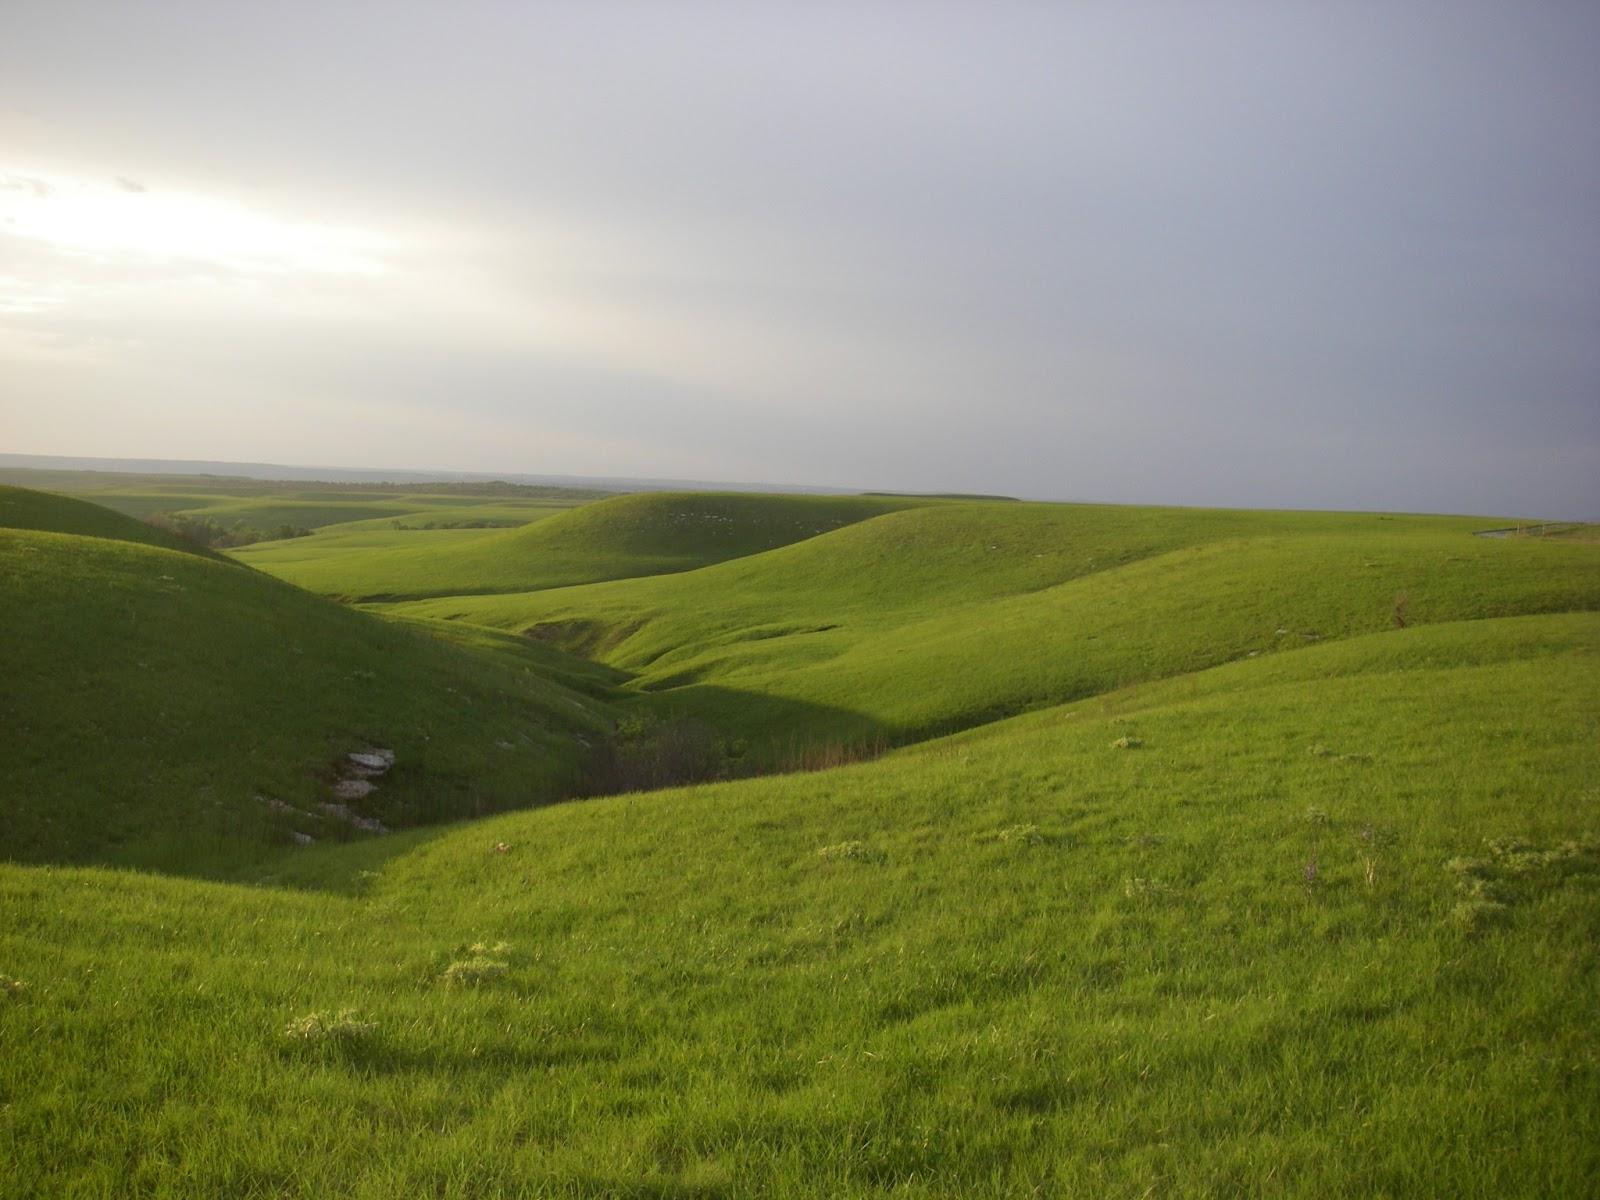 fig1_konza_grass.JPG